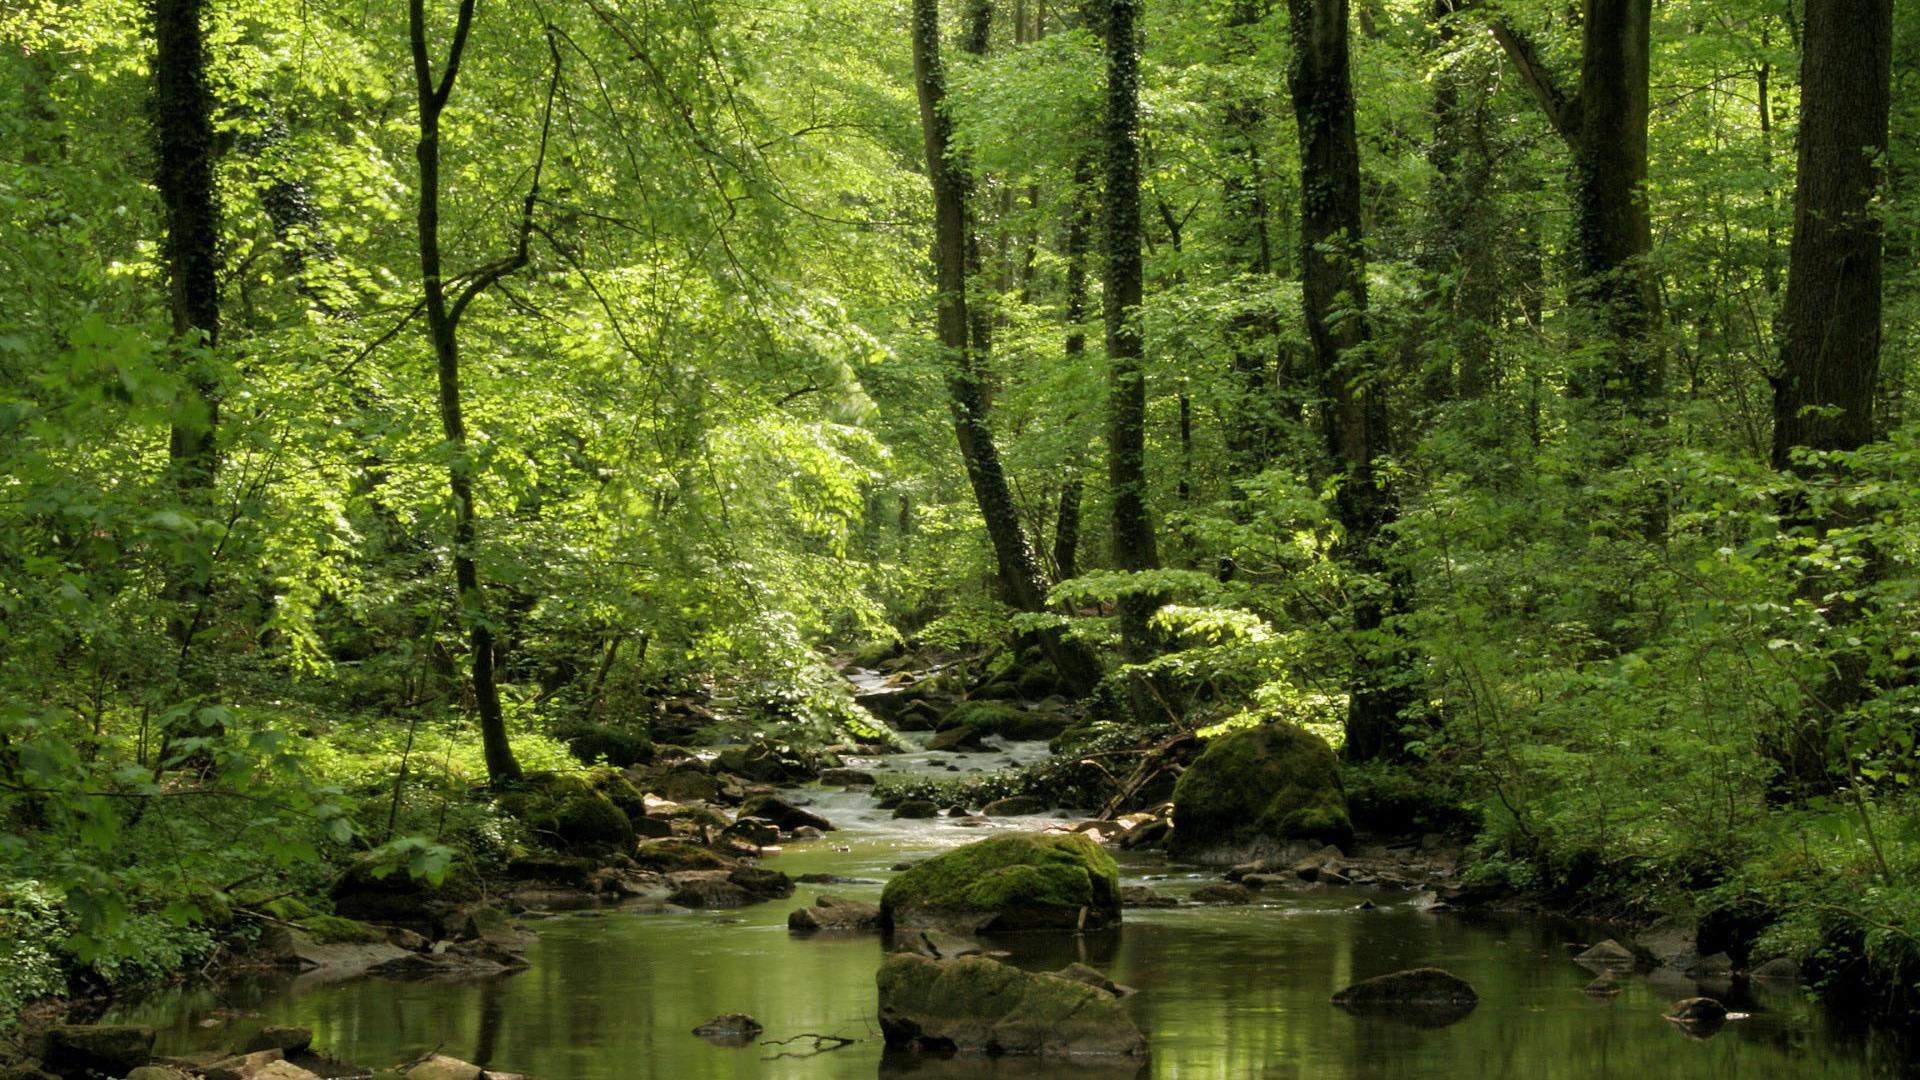 Forest Stream Wallpaper - WallpaperSafari